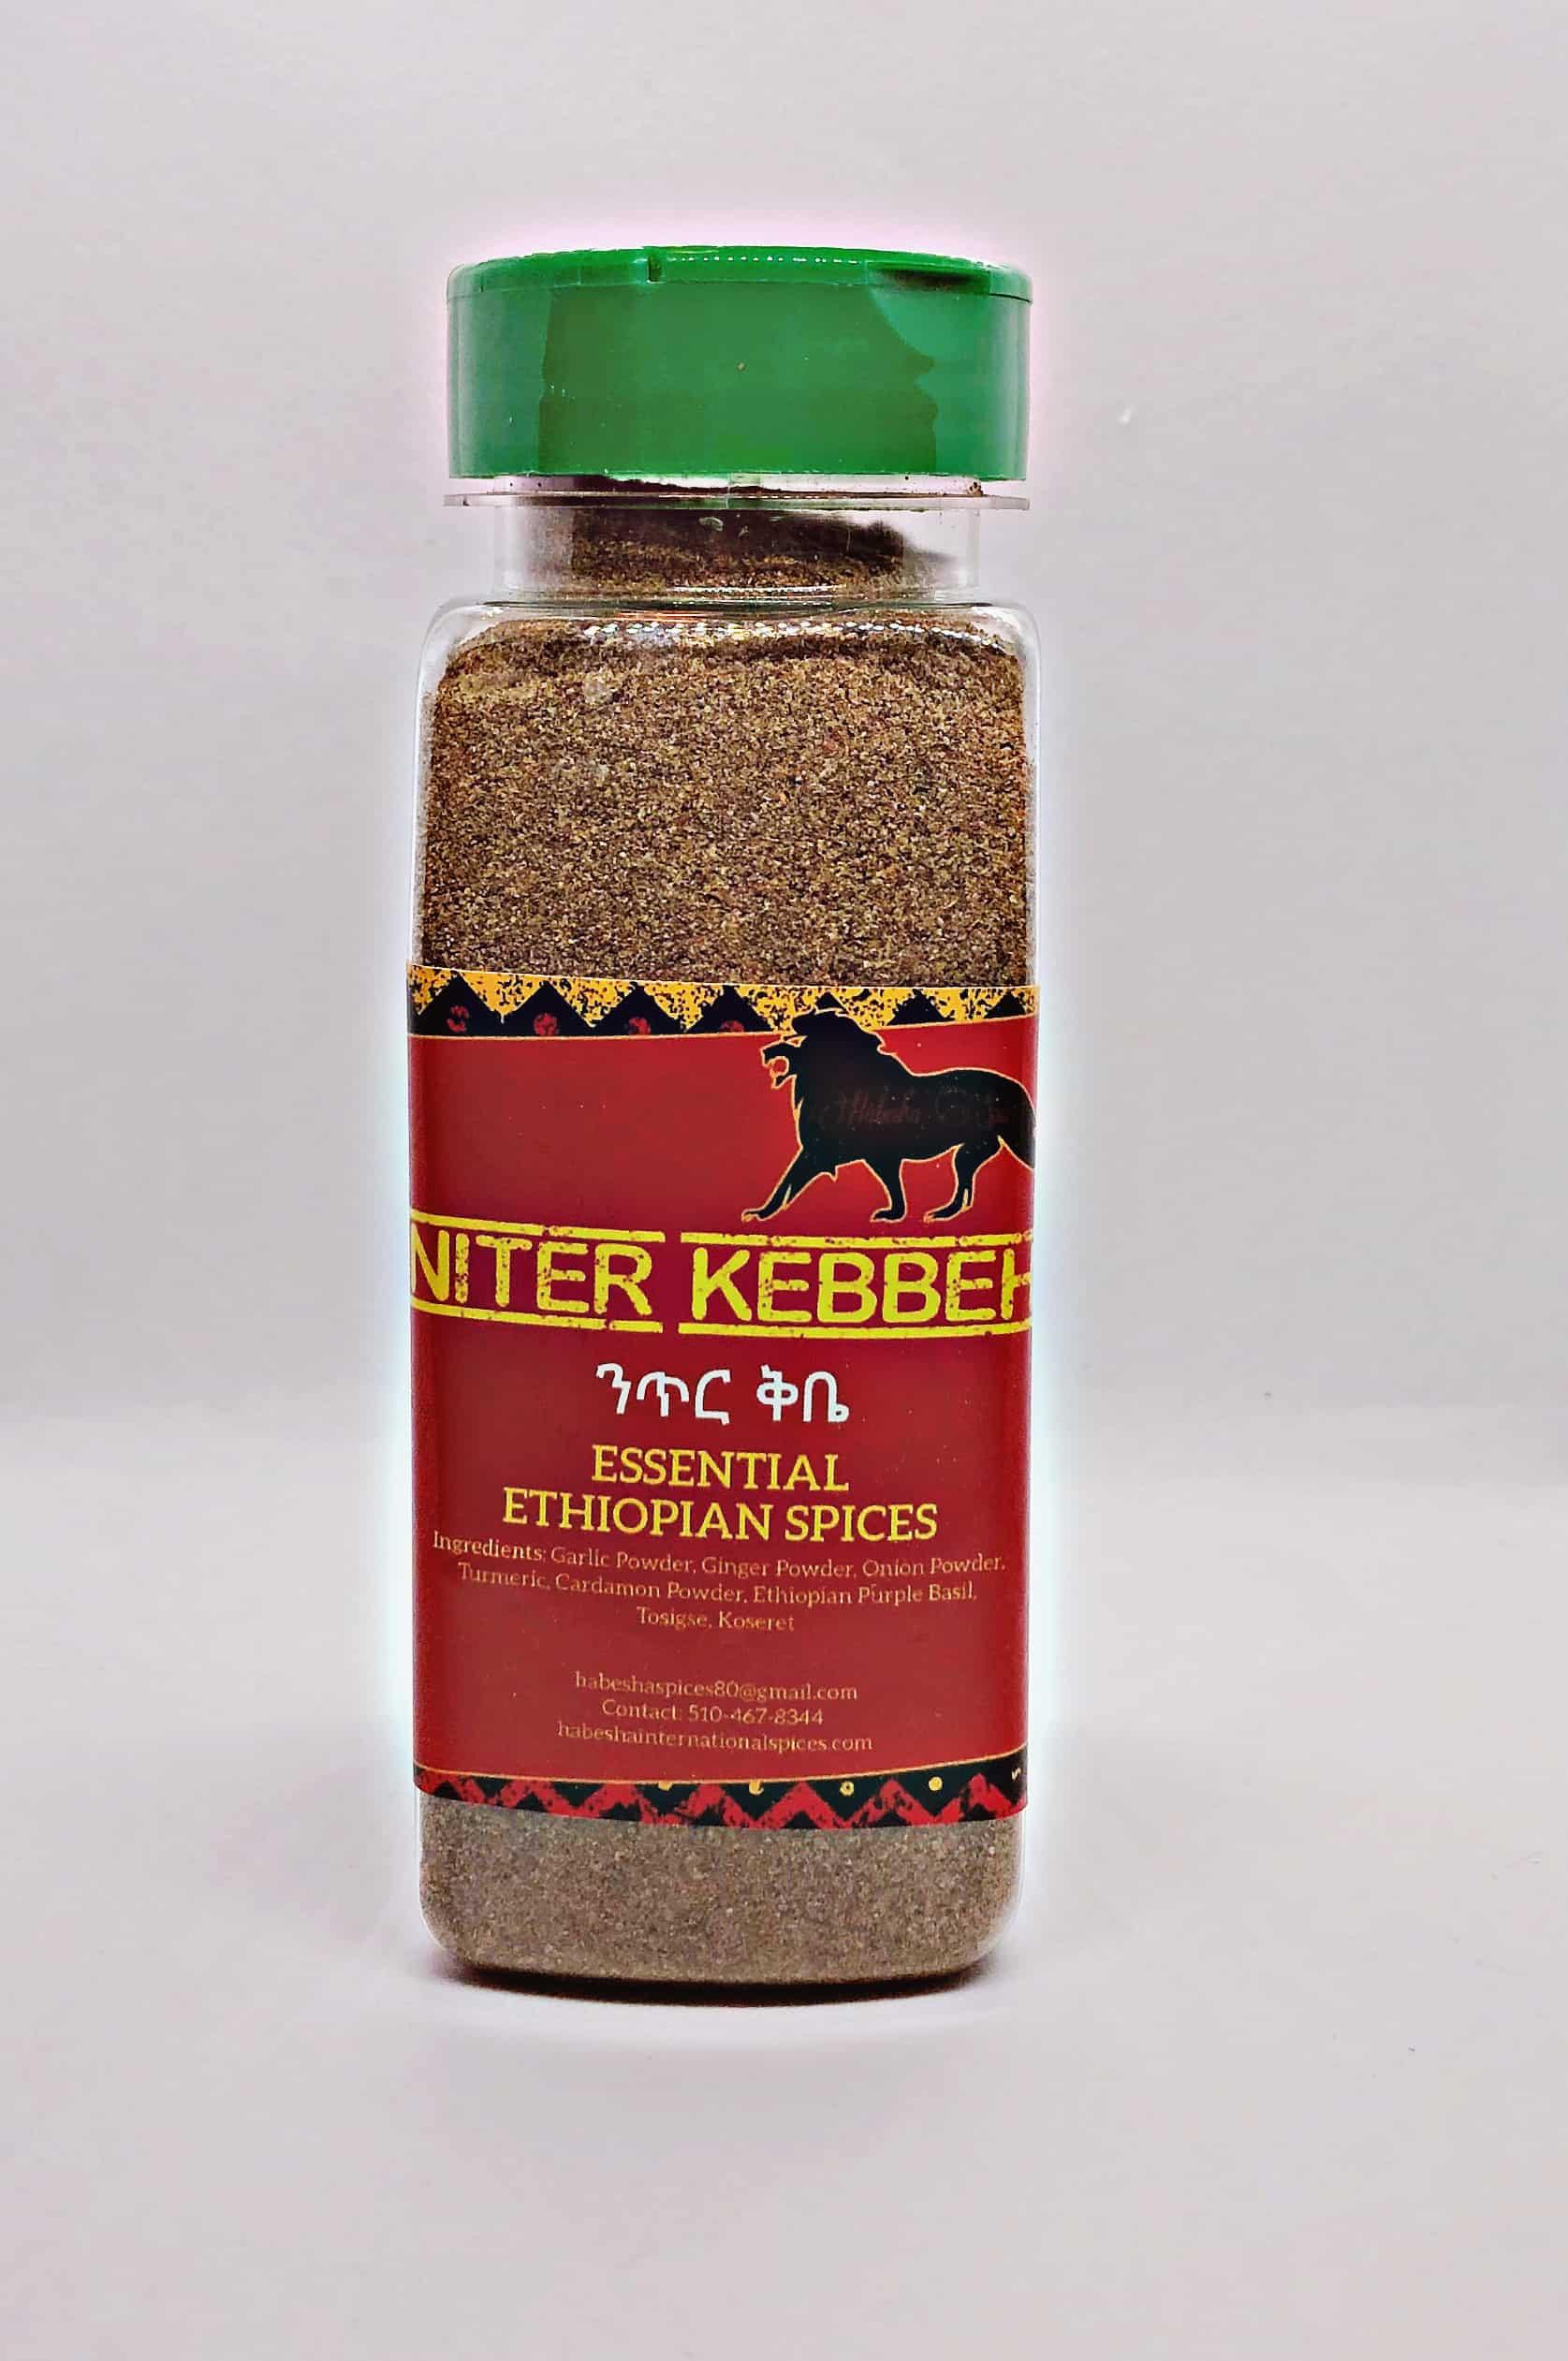 Niter Kebbeh Product Image